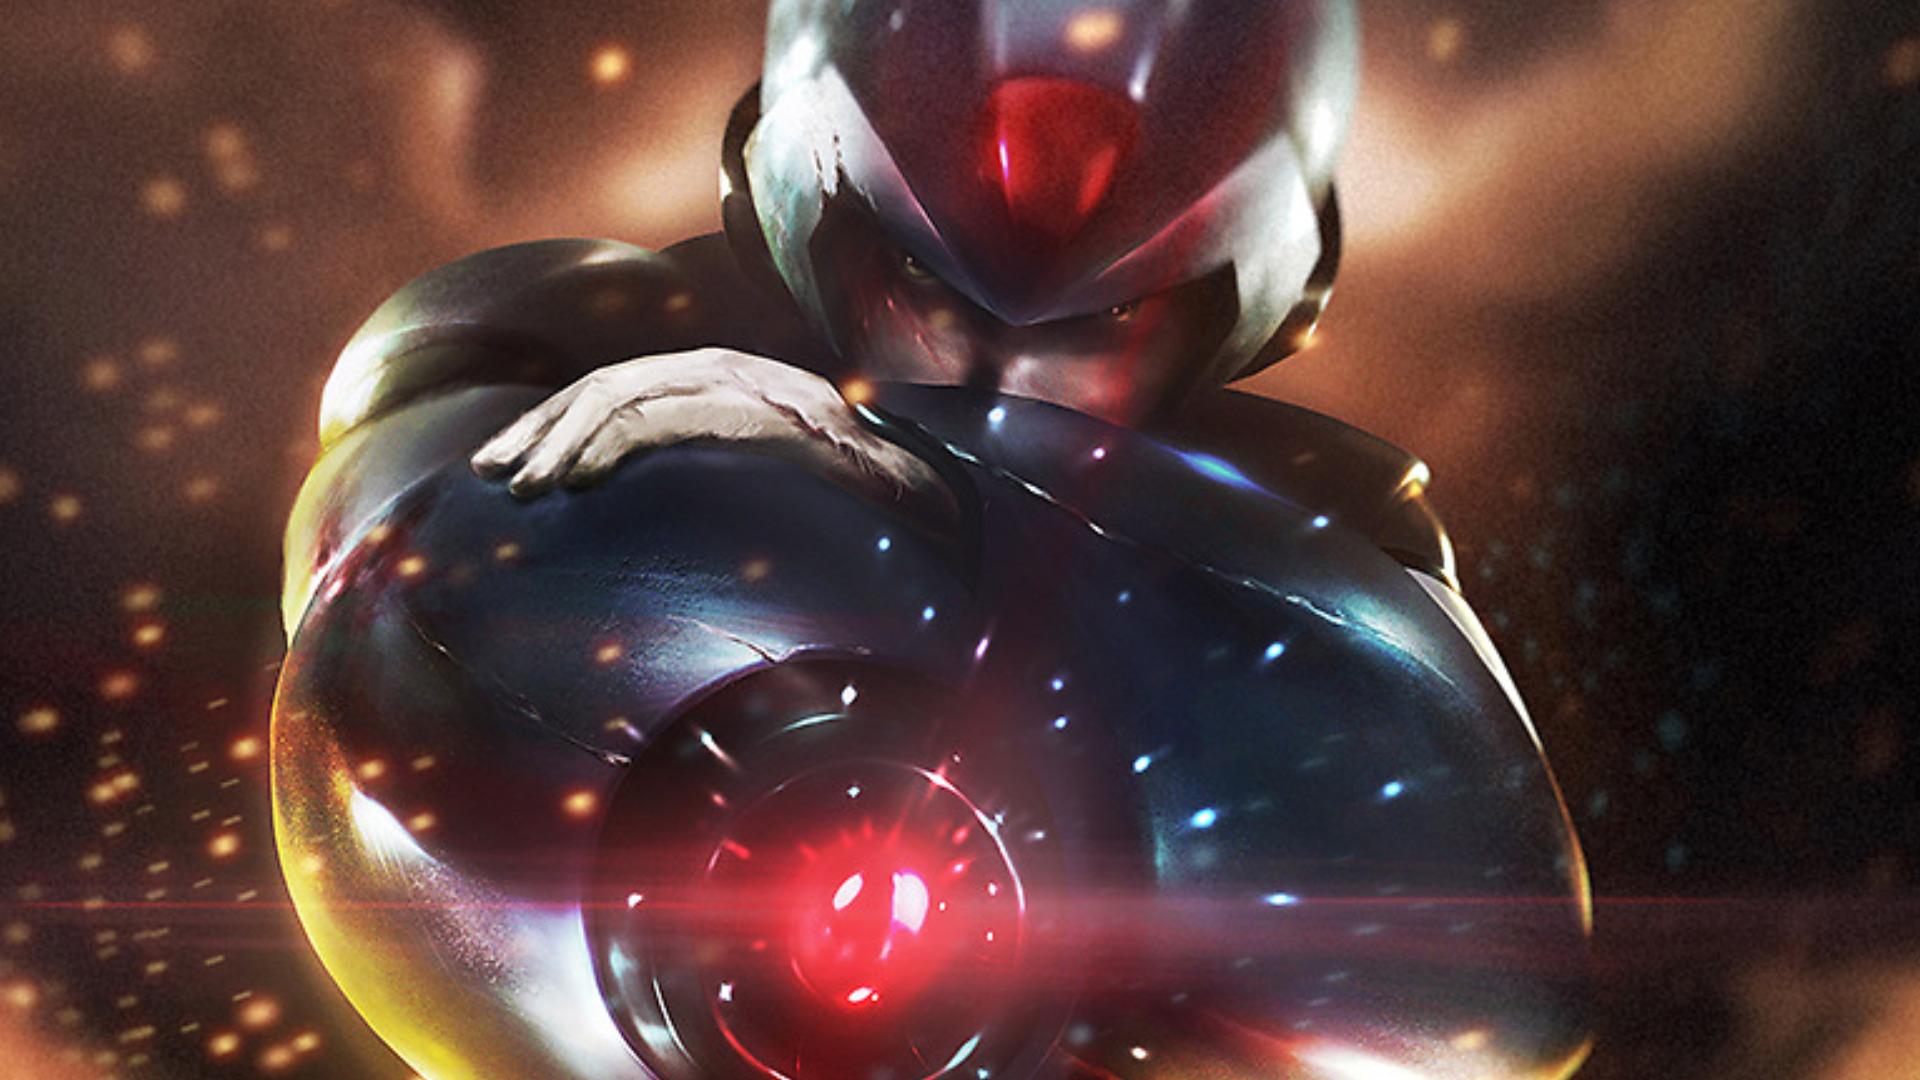 43+] Megaman X Wallpaper HD on WallpaperSafari